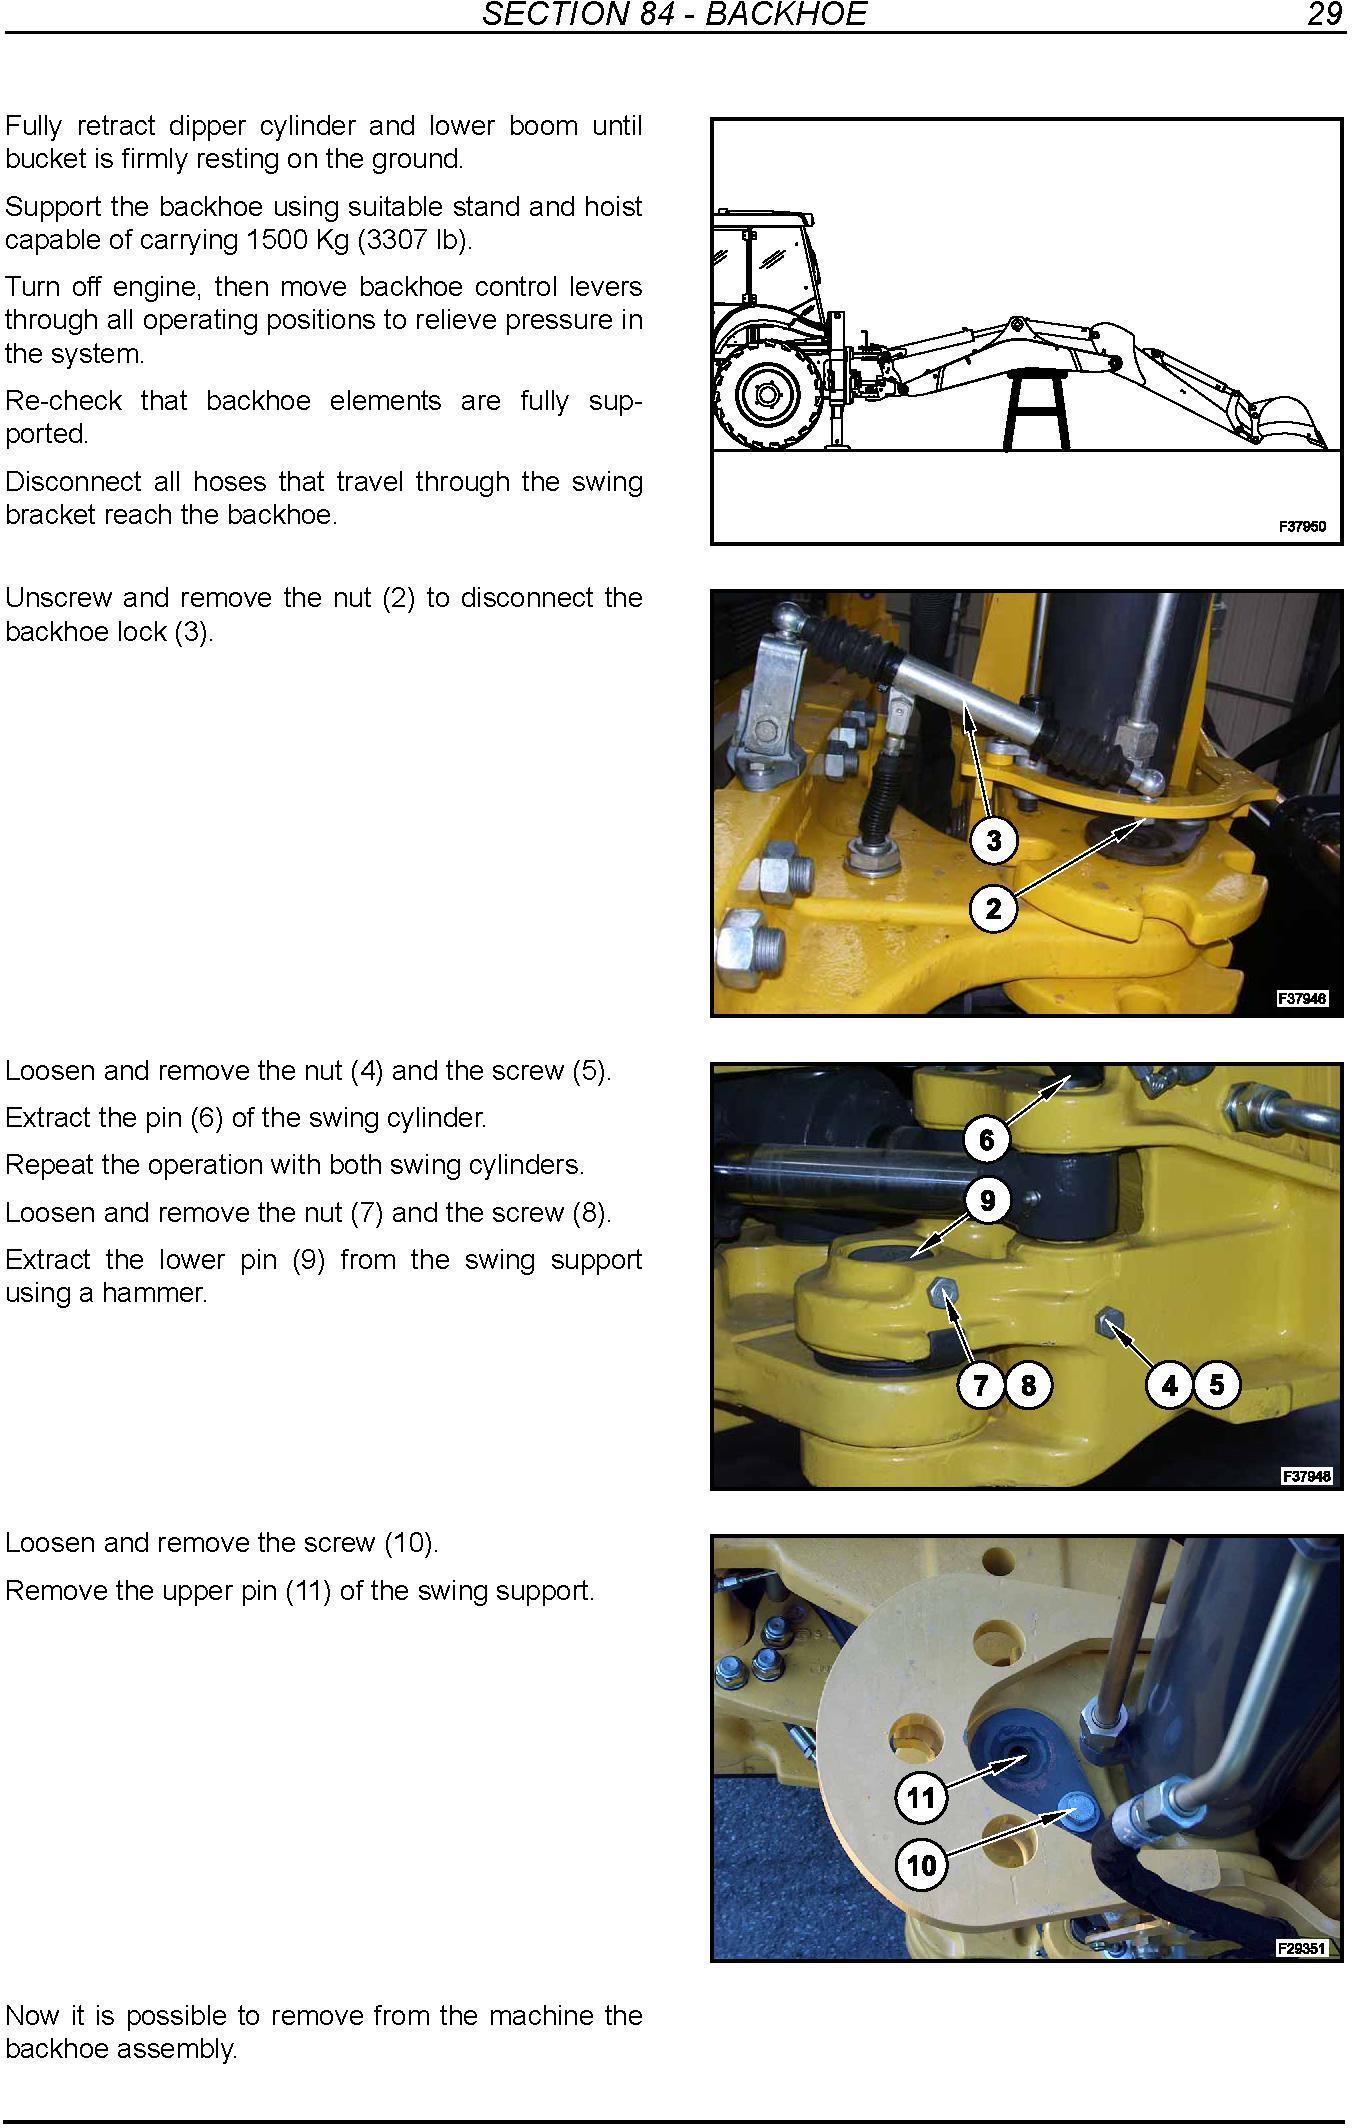 New Holland B90B /BLR, B100B /BLR, B100BTC, B110B /BTC, B115B Tier 3 Backhoe Loaders Service Manual - 3